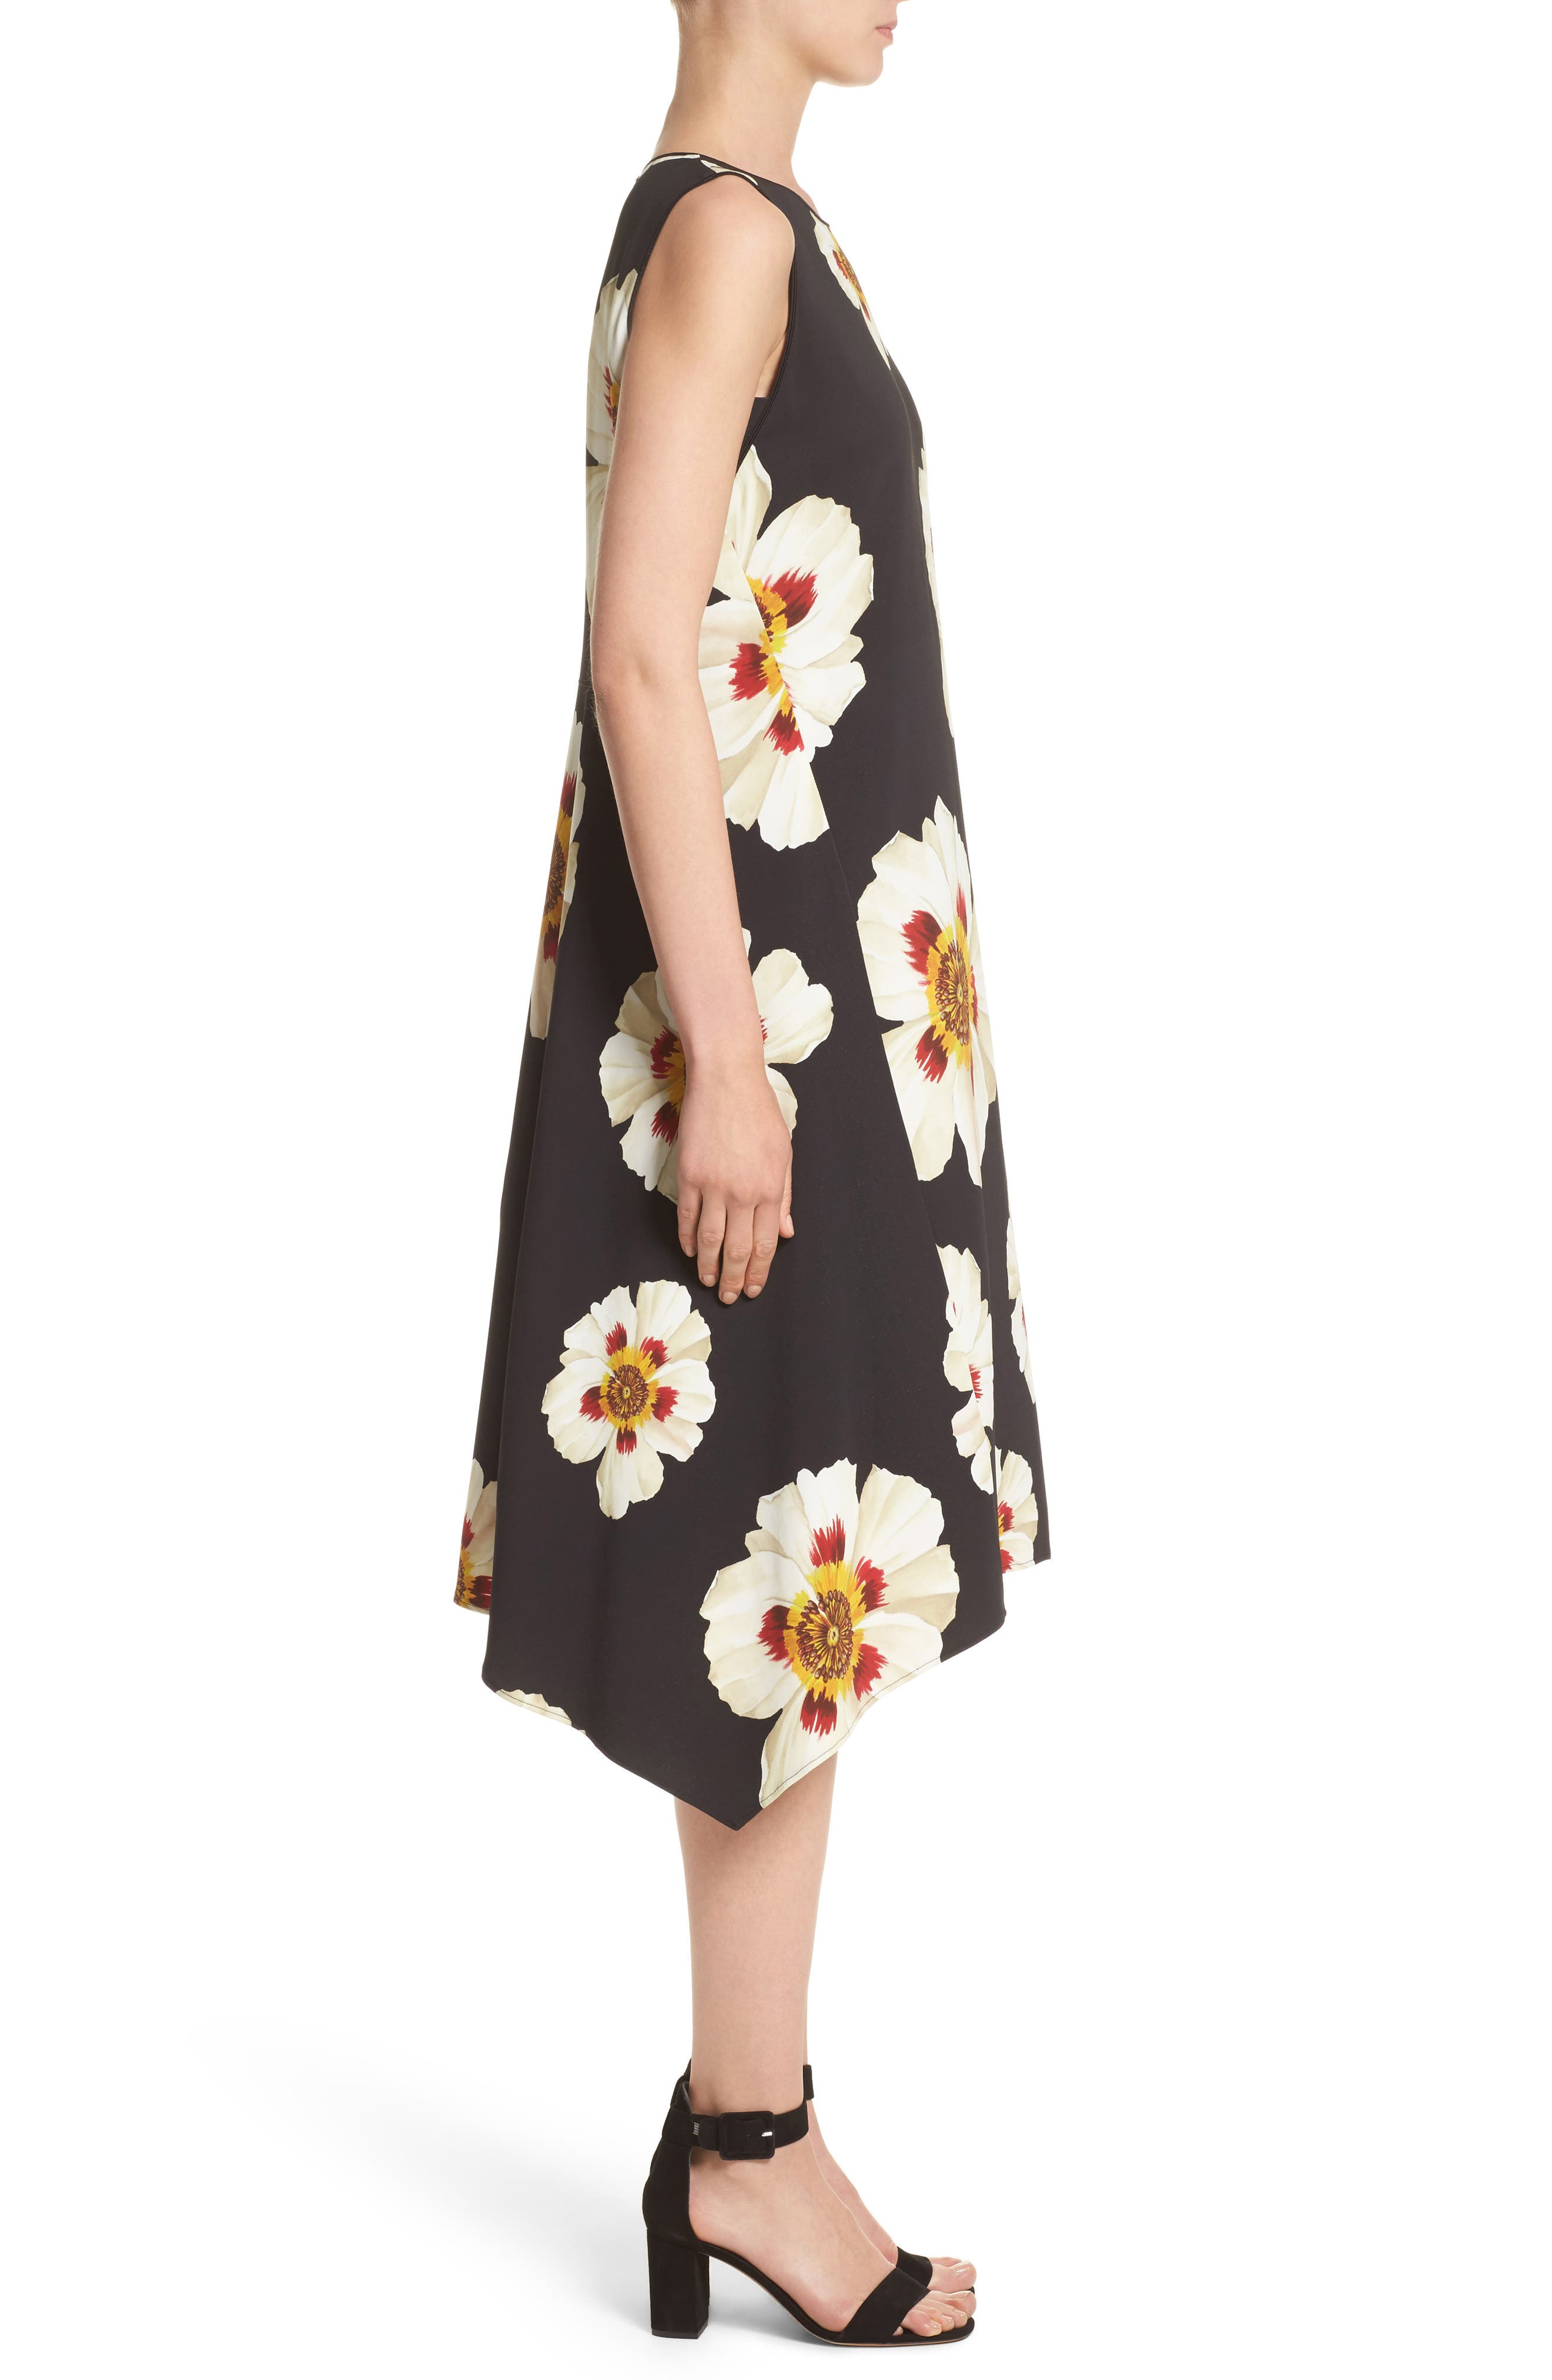 Romona Floral Fluid Cloth Dress,                             Alternate thumbnail 3, color,                             001